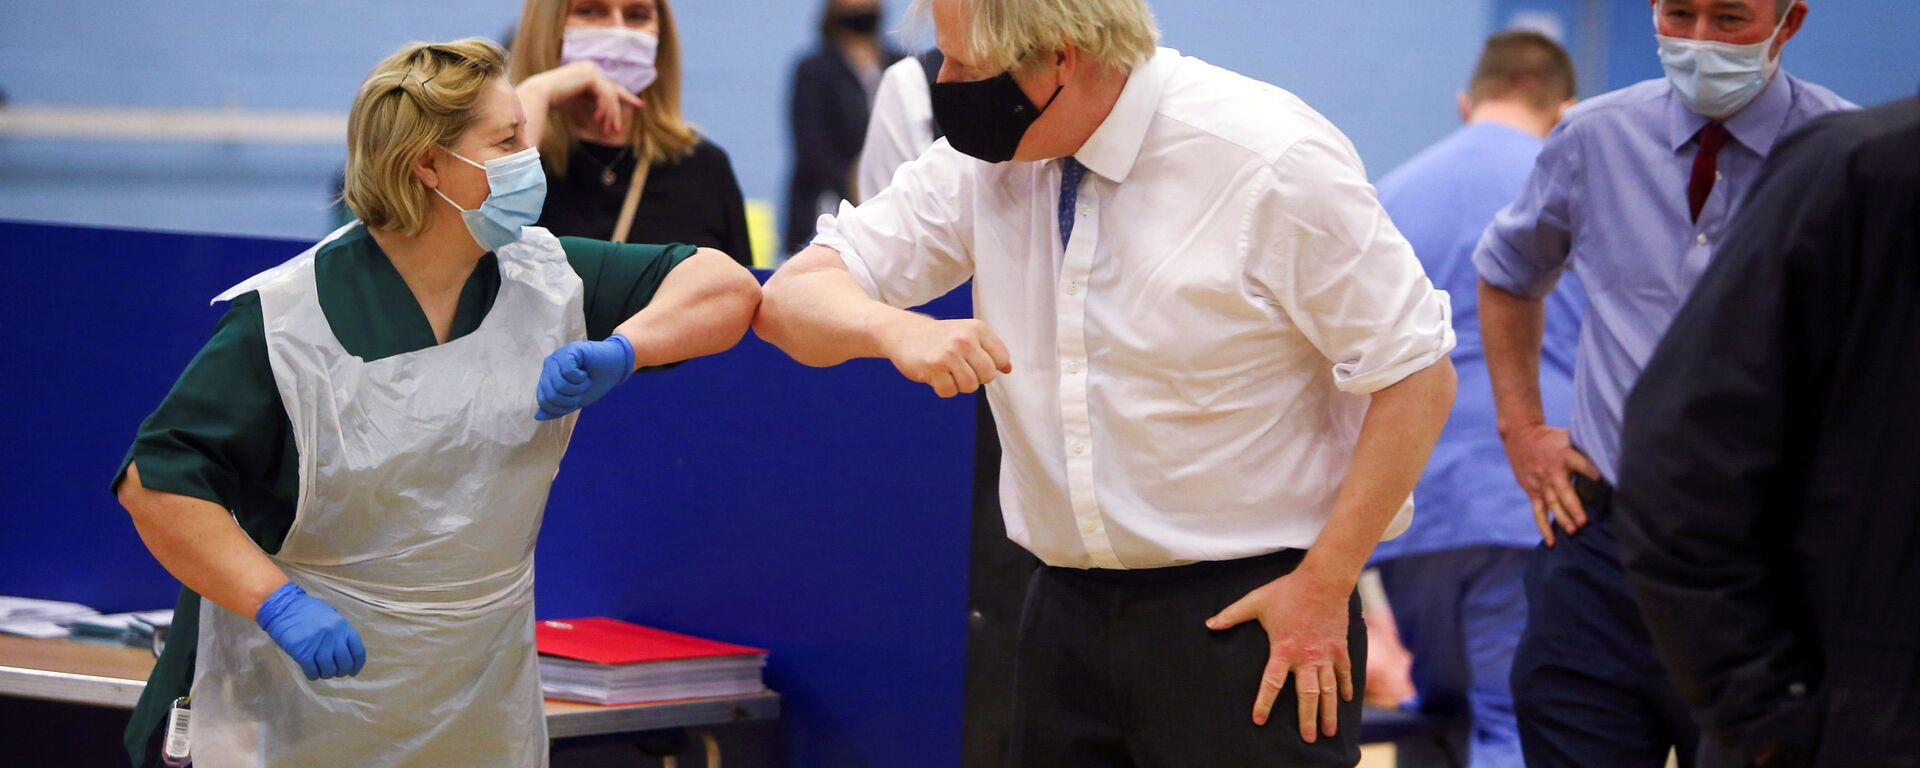 Премьер-министр Великобритании Борис Джонсон с медсестрой во время посещения центра вакцинации от коронавируса в Кумбране - Sputnik Italia, 1920, 02.08.2021